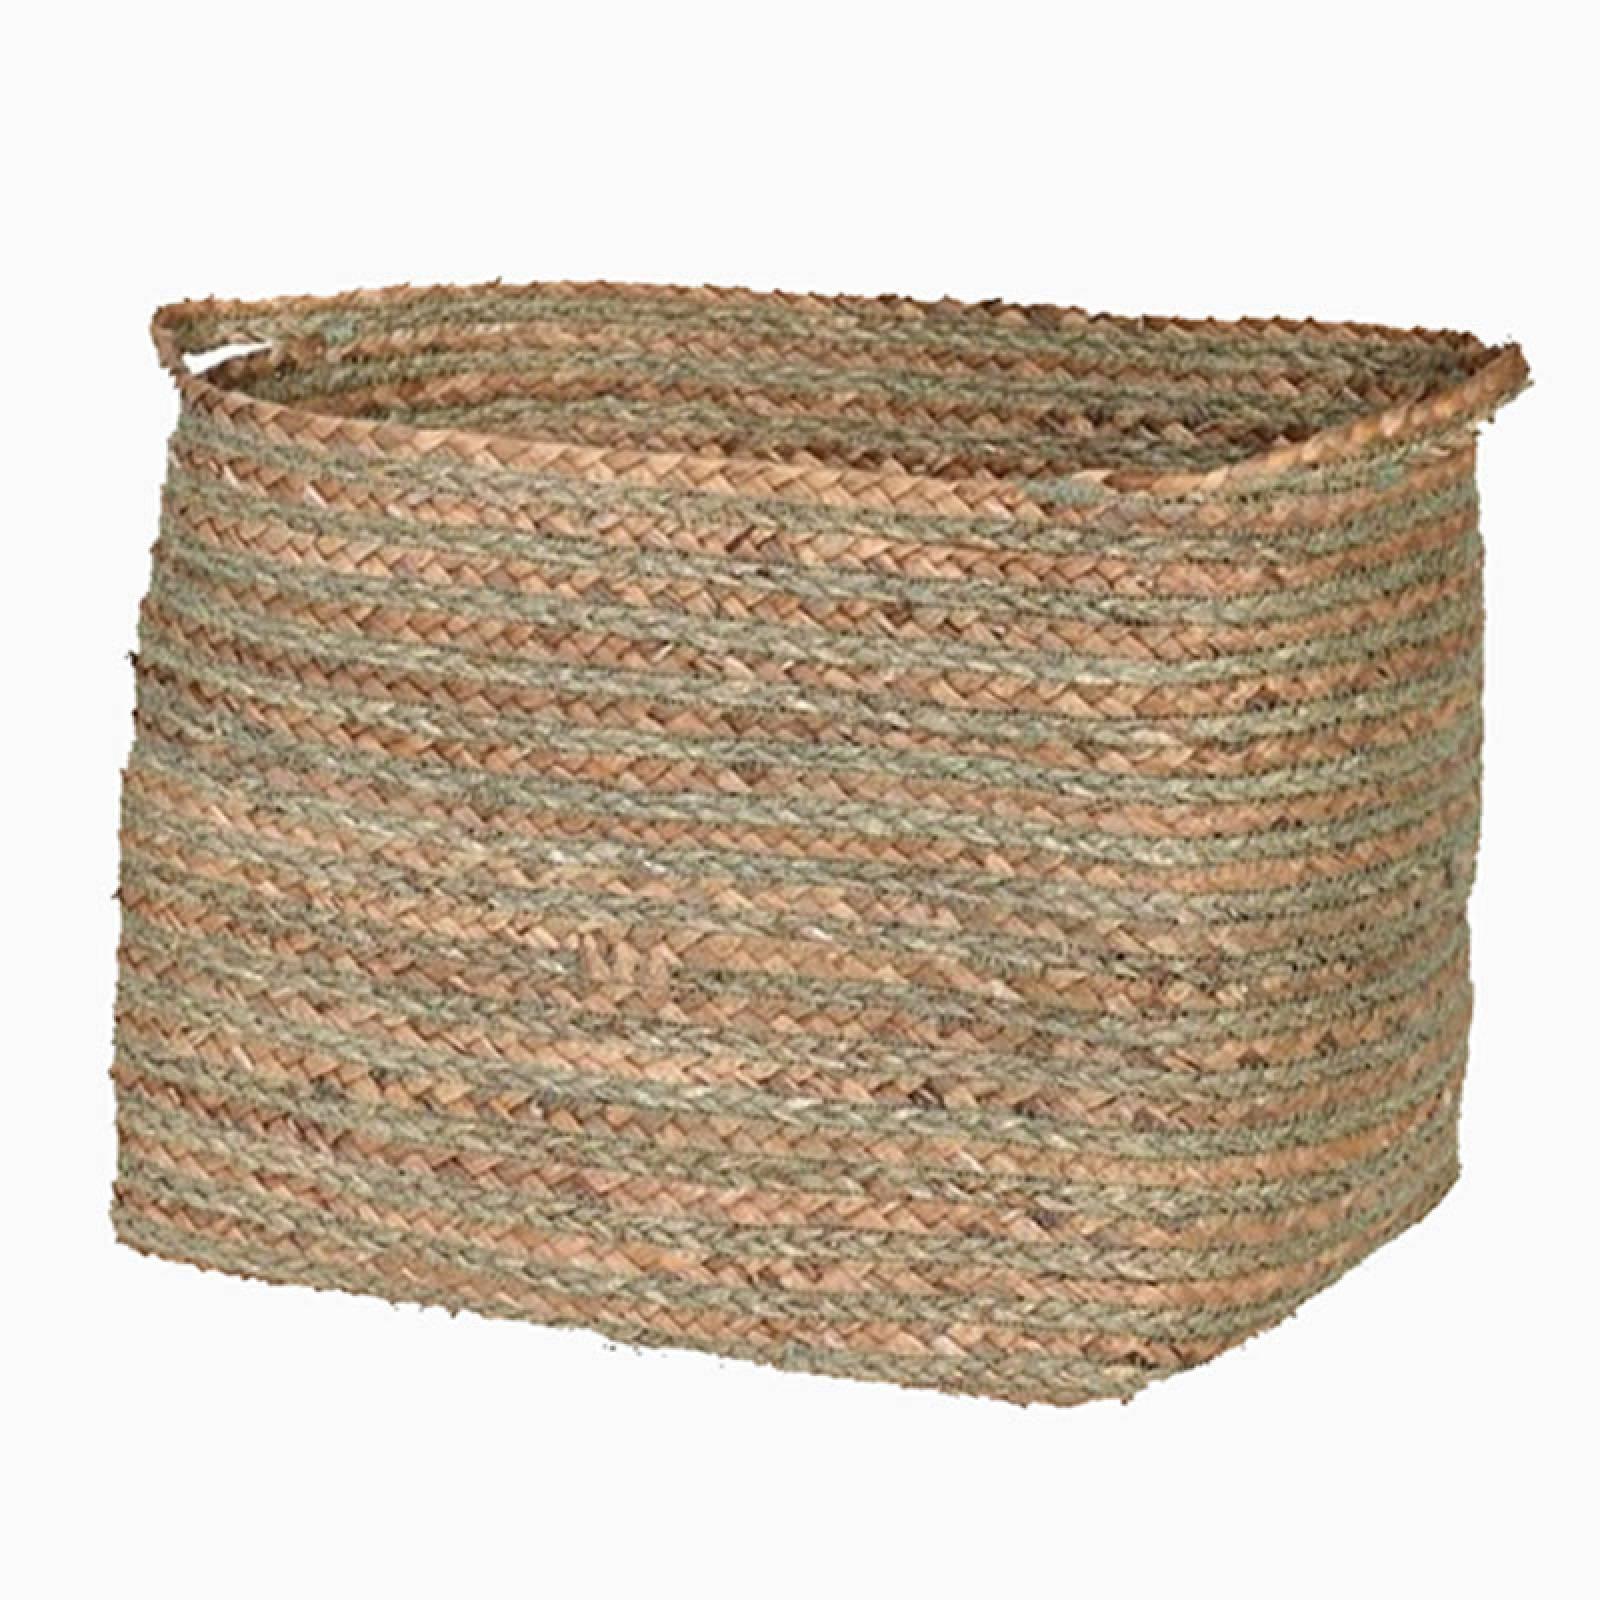 Rectangular Basket With Handles